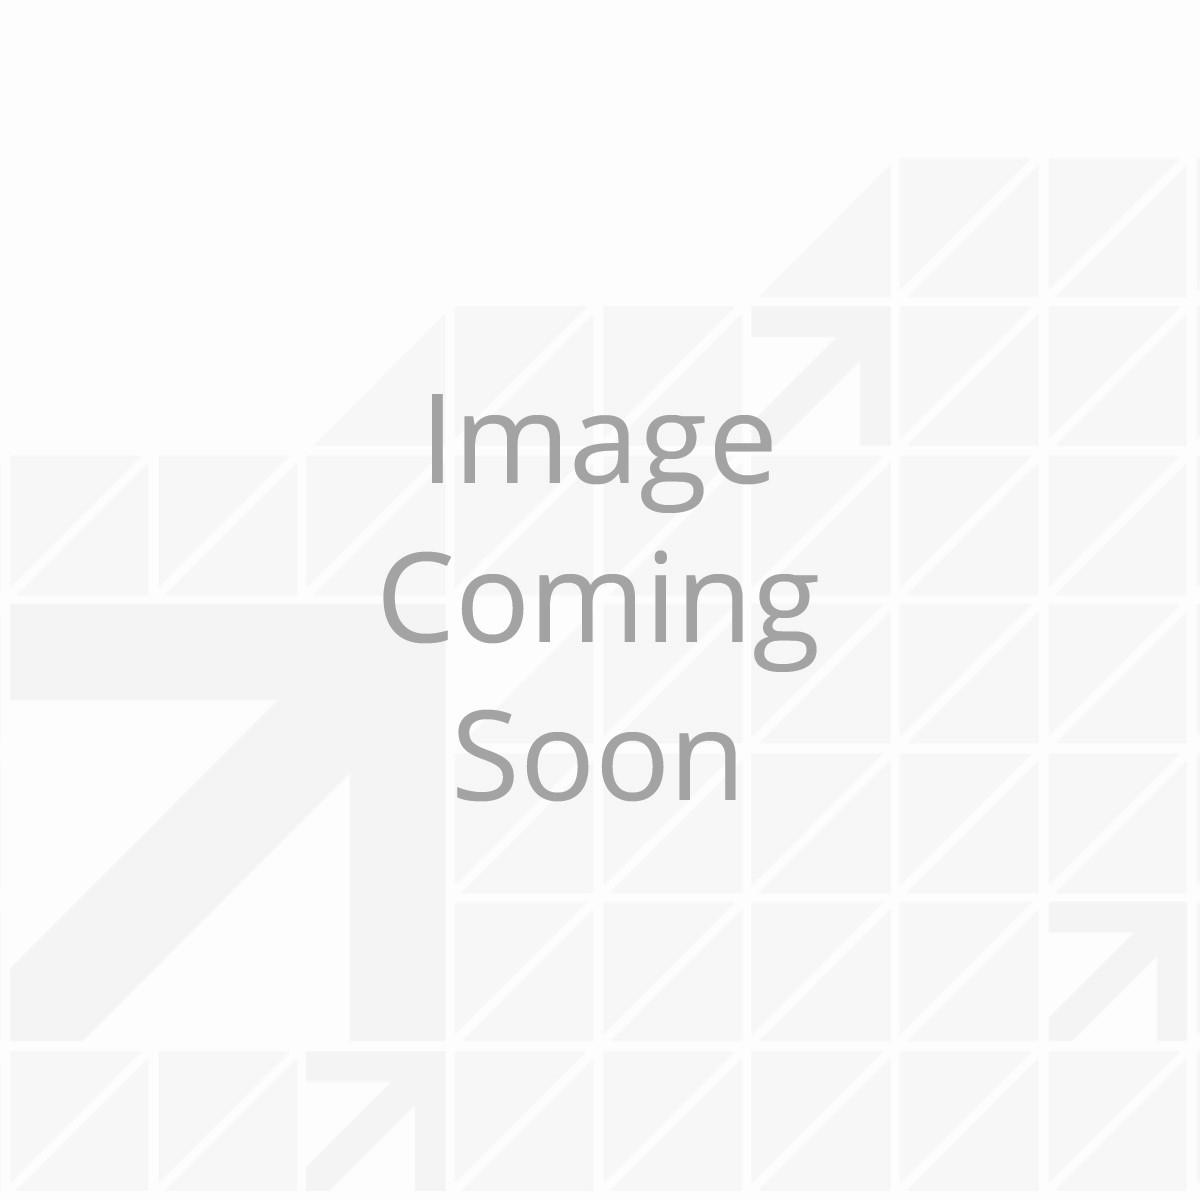 258550_-_20k_aluminum_jack_-_001